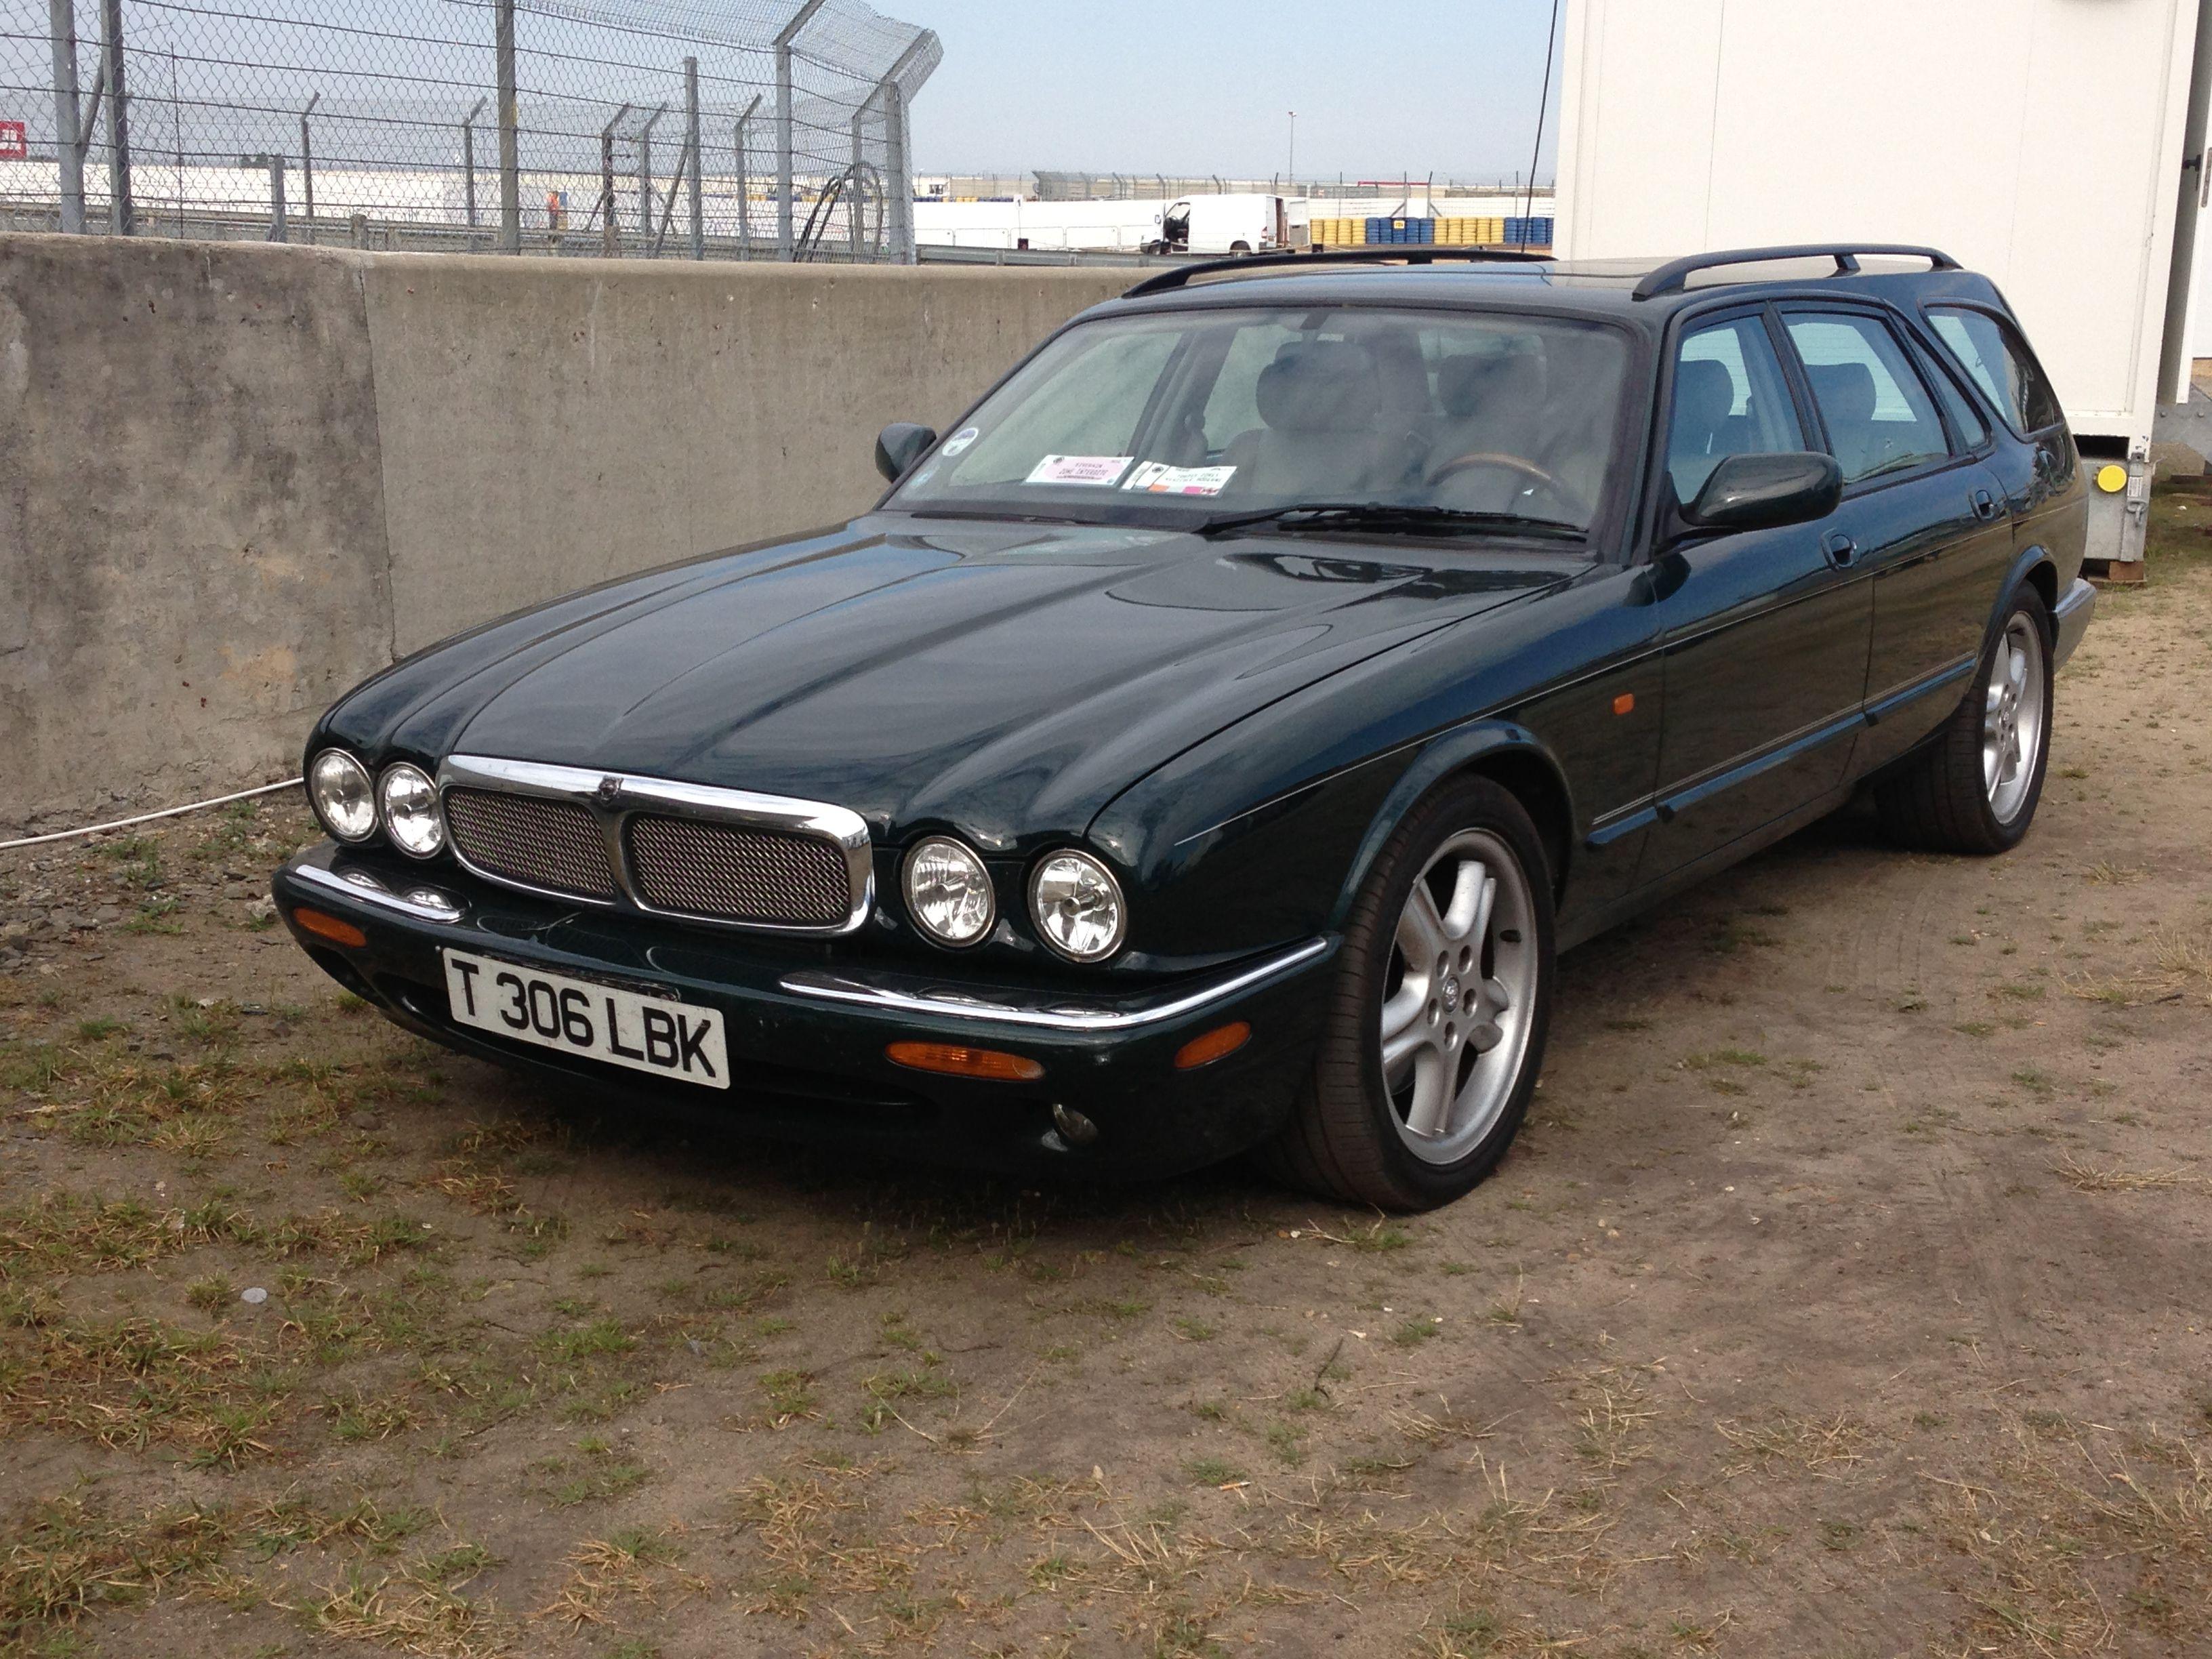 Xj300 Wagon Jaguar Shooting Brake Classic Cars